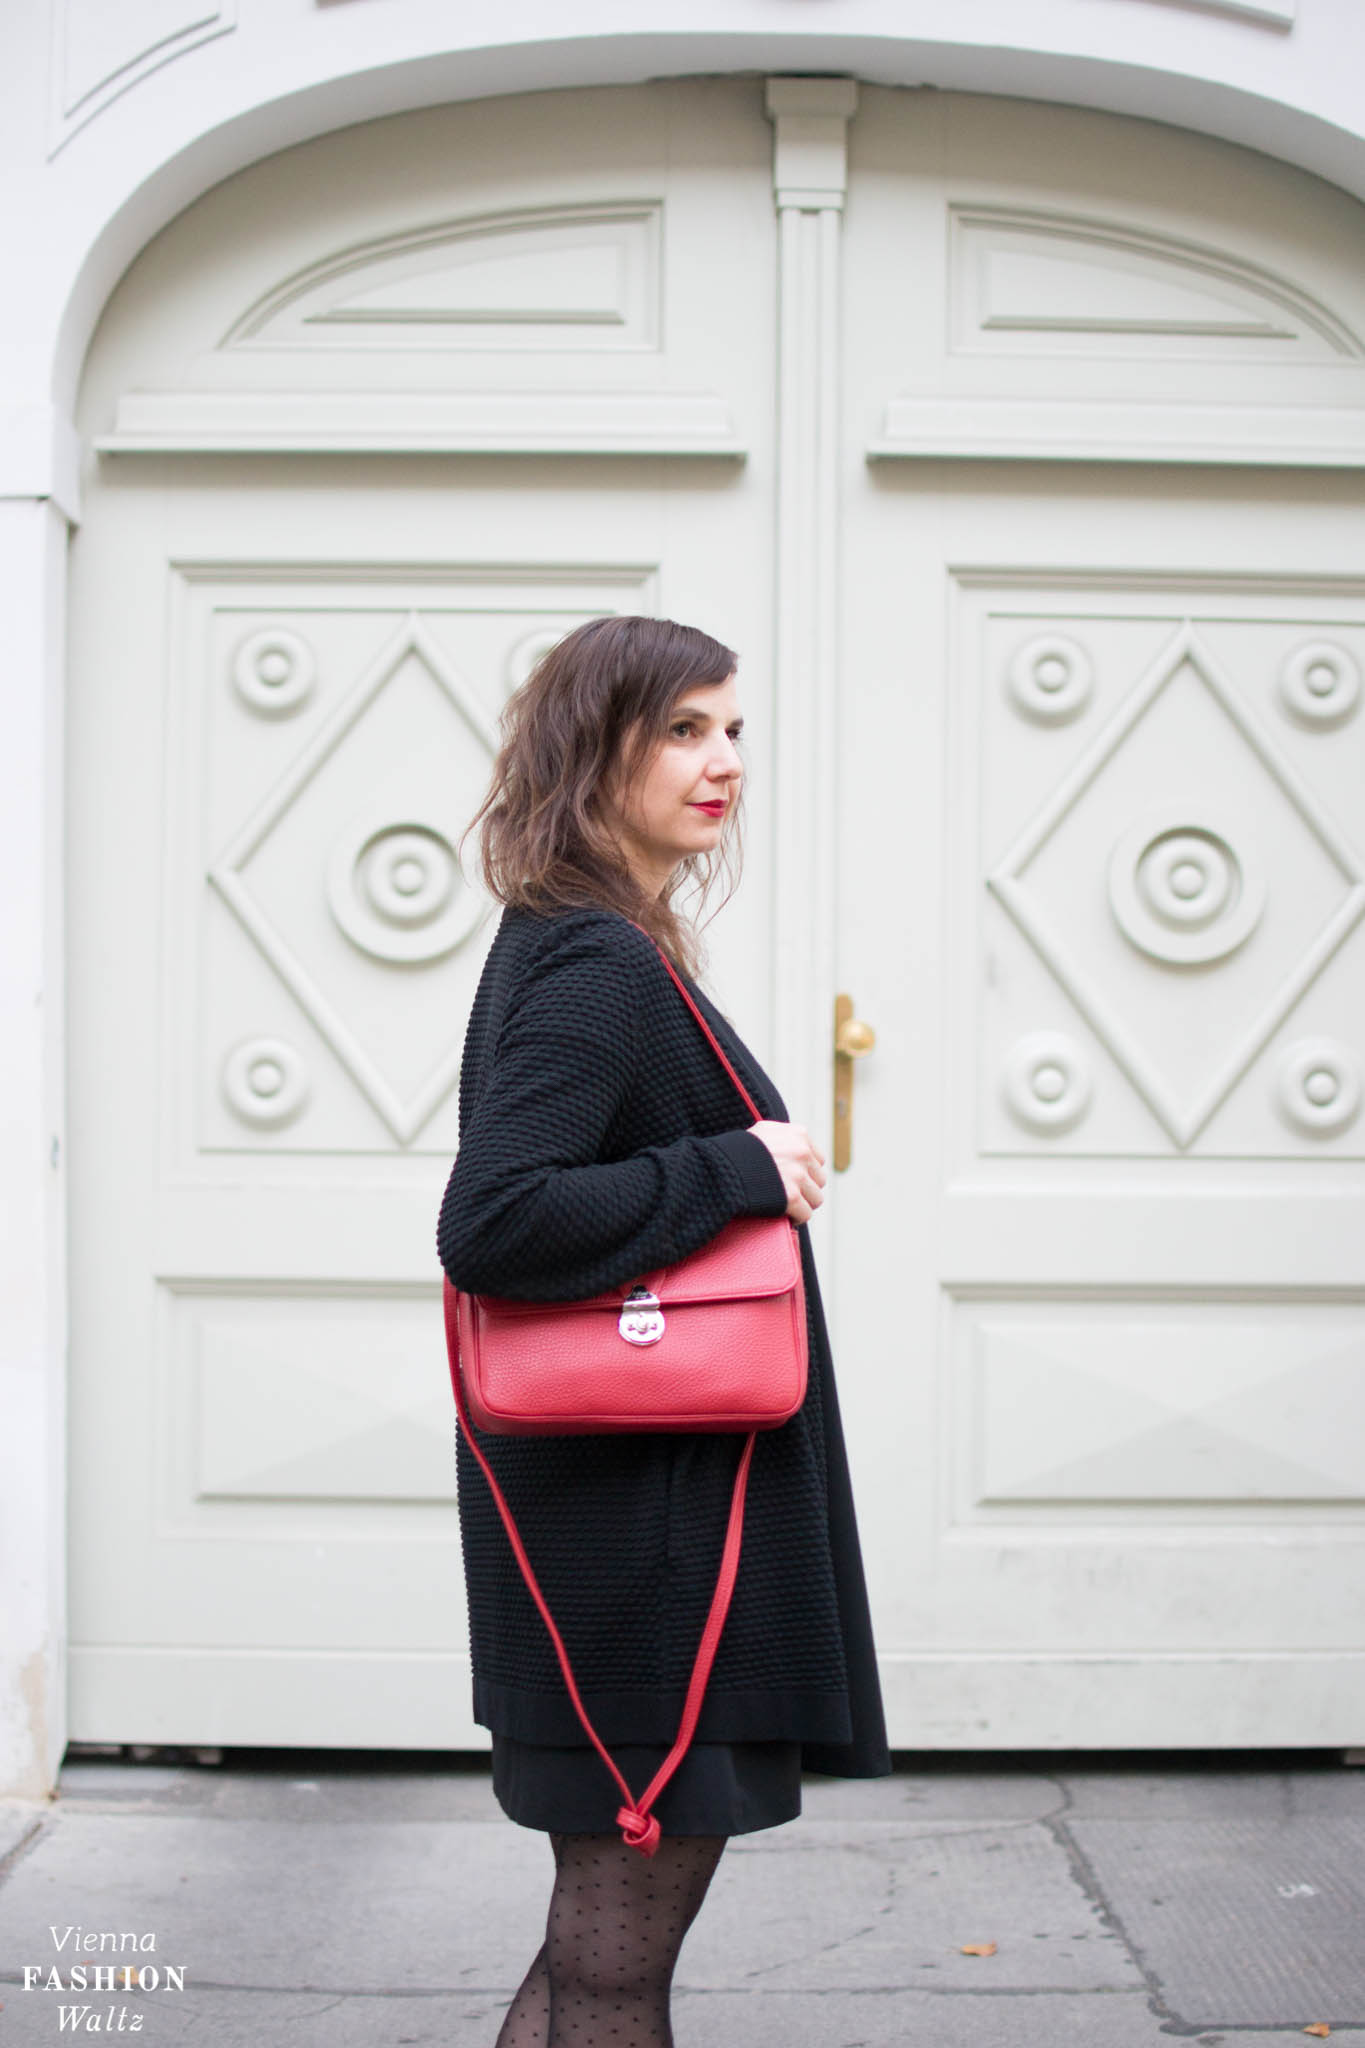 Rote It-Bag aus Wien R.Horns Polka Dot Outfit